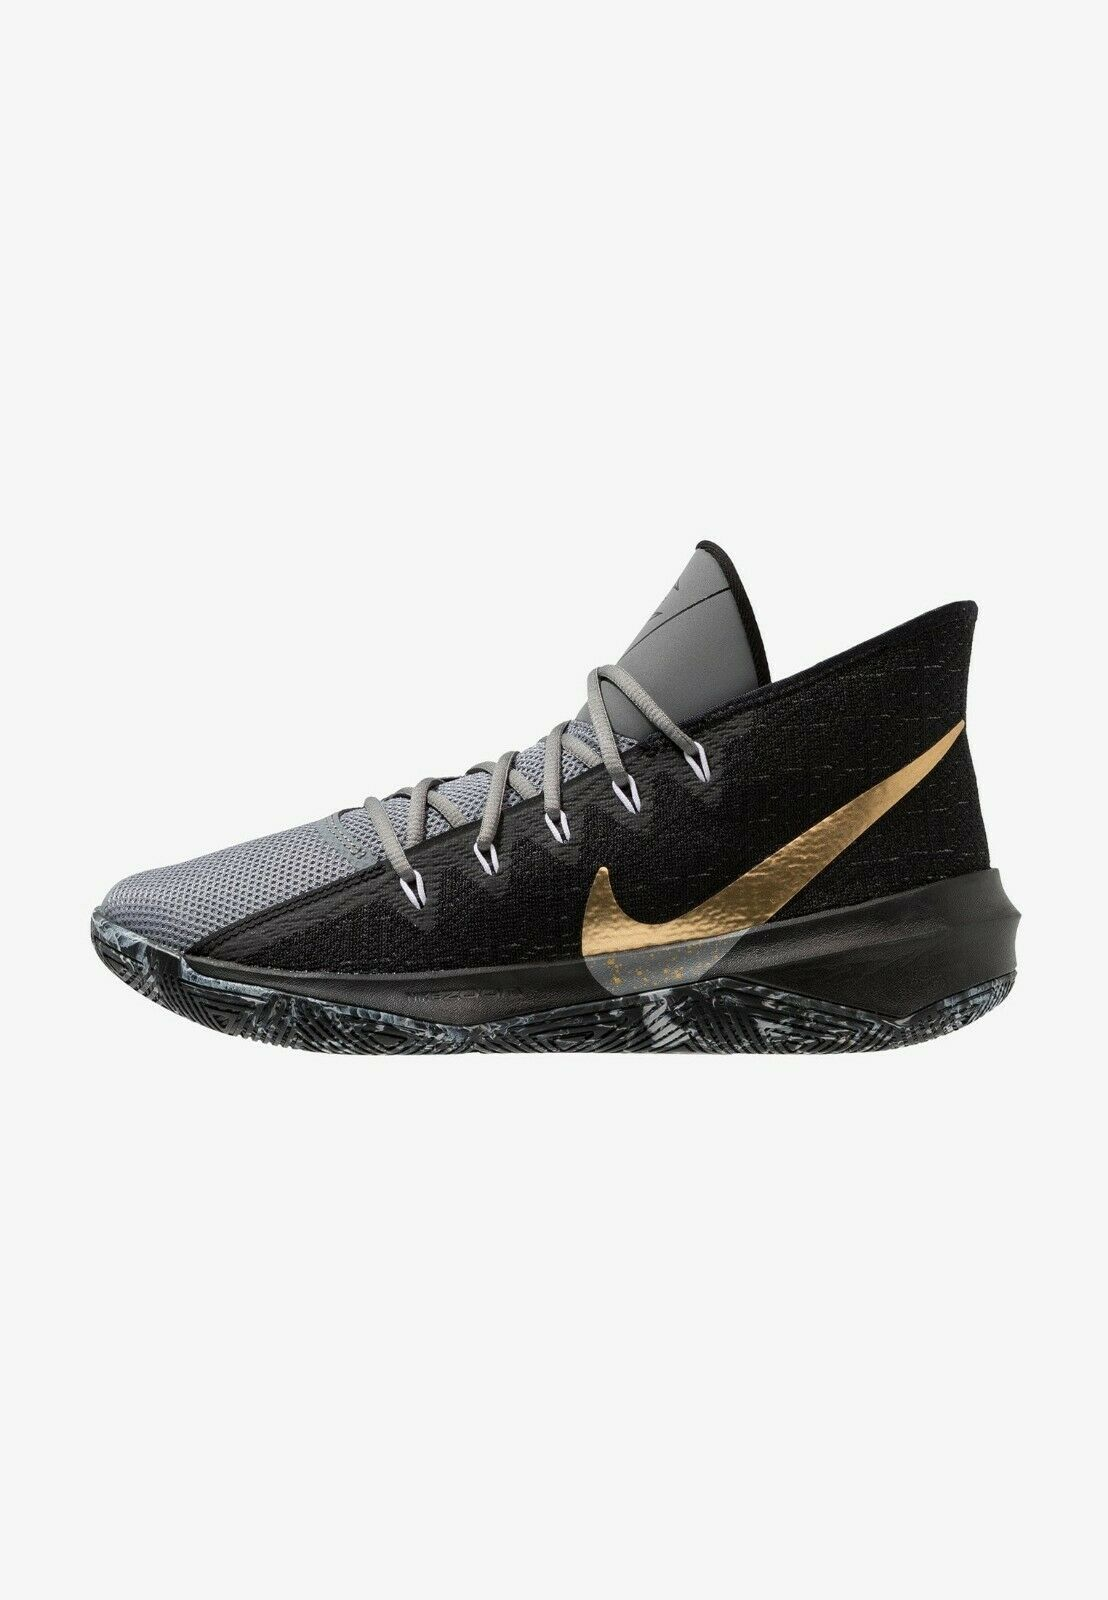 Nike Zoom Evidence III 3 - Men Basketbtutti Sautope classeiche da uomo